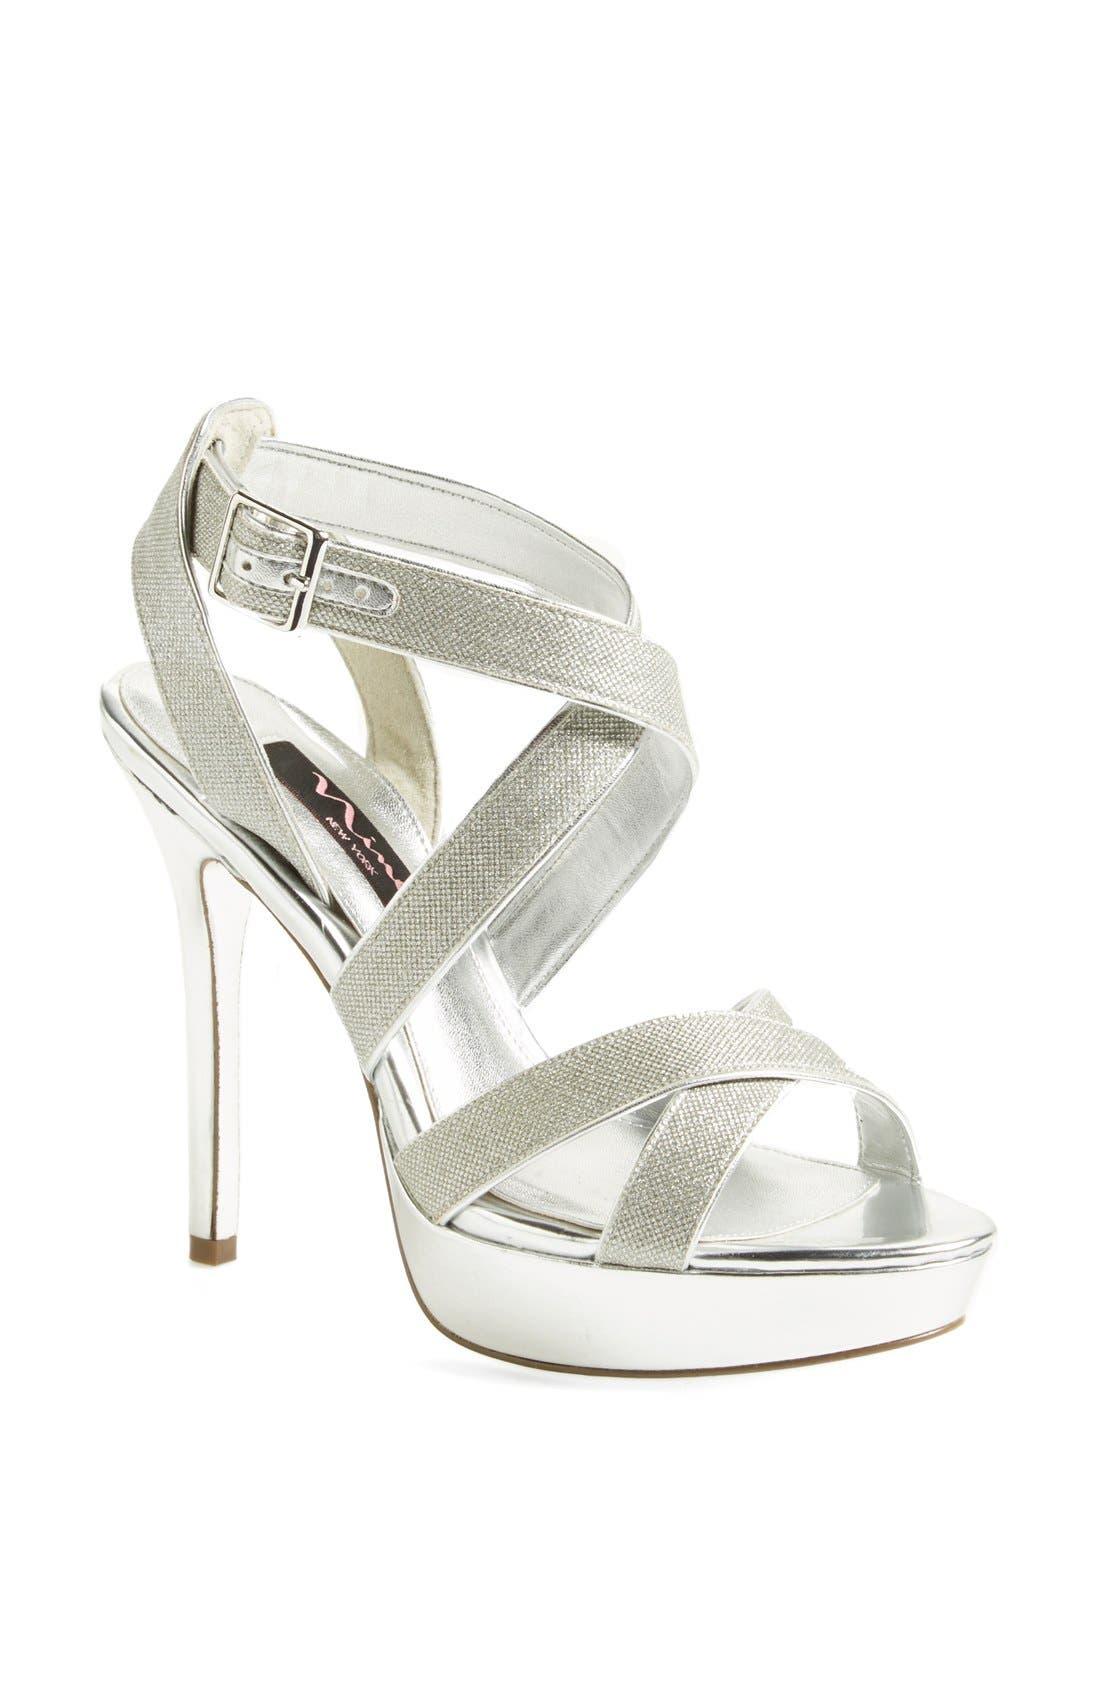 Alternate Image 1 Selected - Nina 'Josette' Sandal